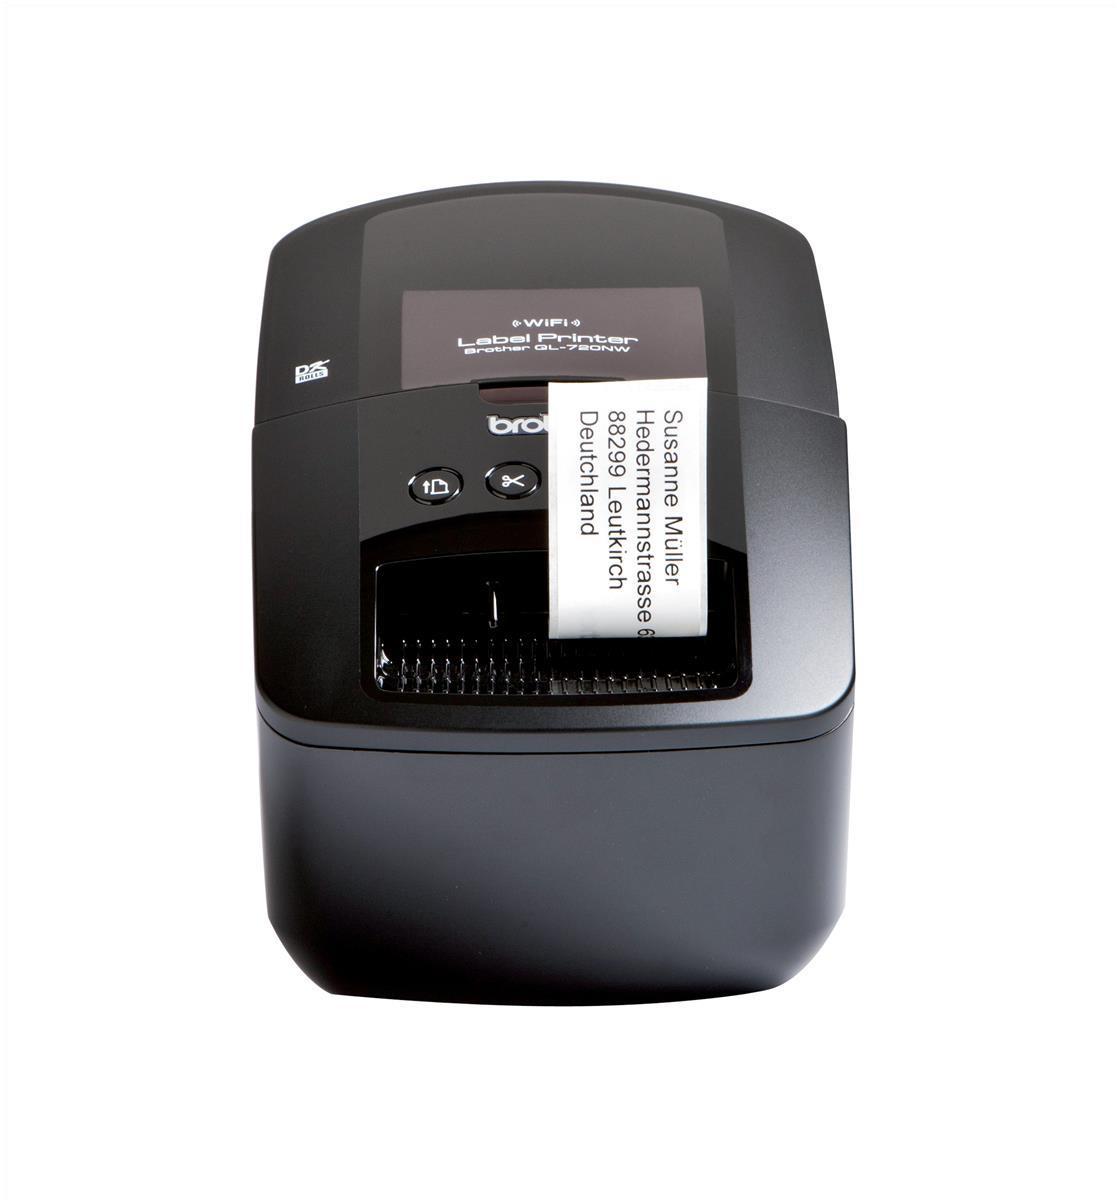 Image for Brother Labelmaker Desktop PC Ethernet Wireless DK max. 62mm Ref QL720NWZU1